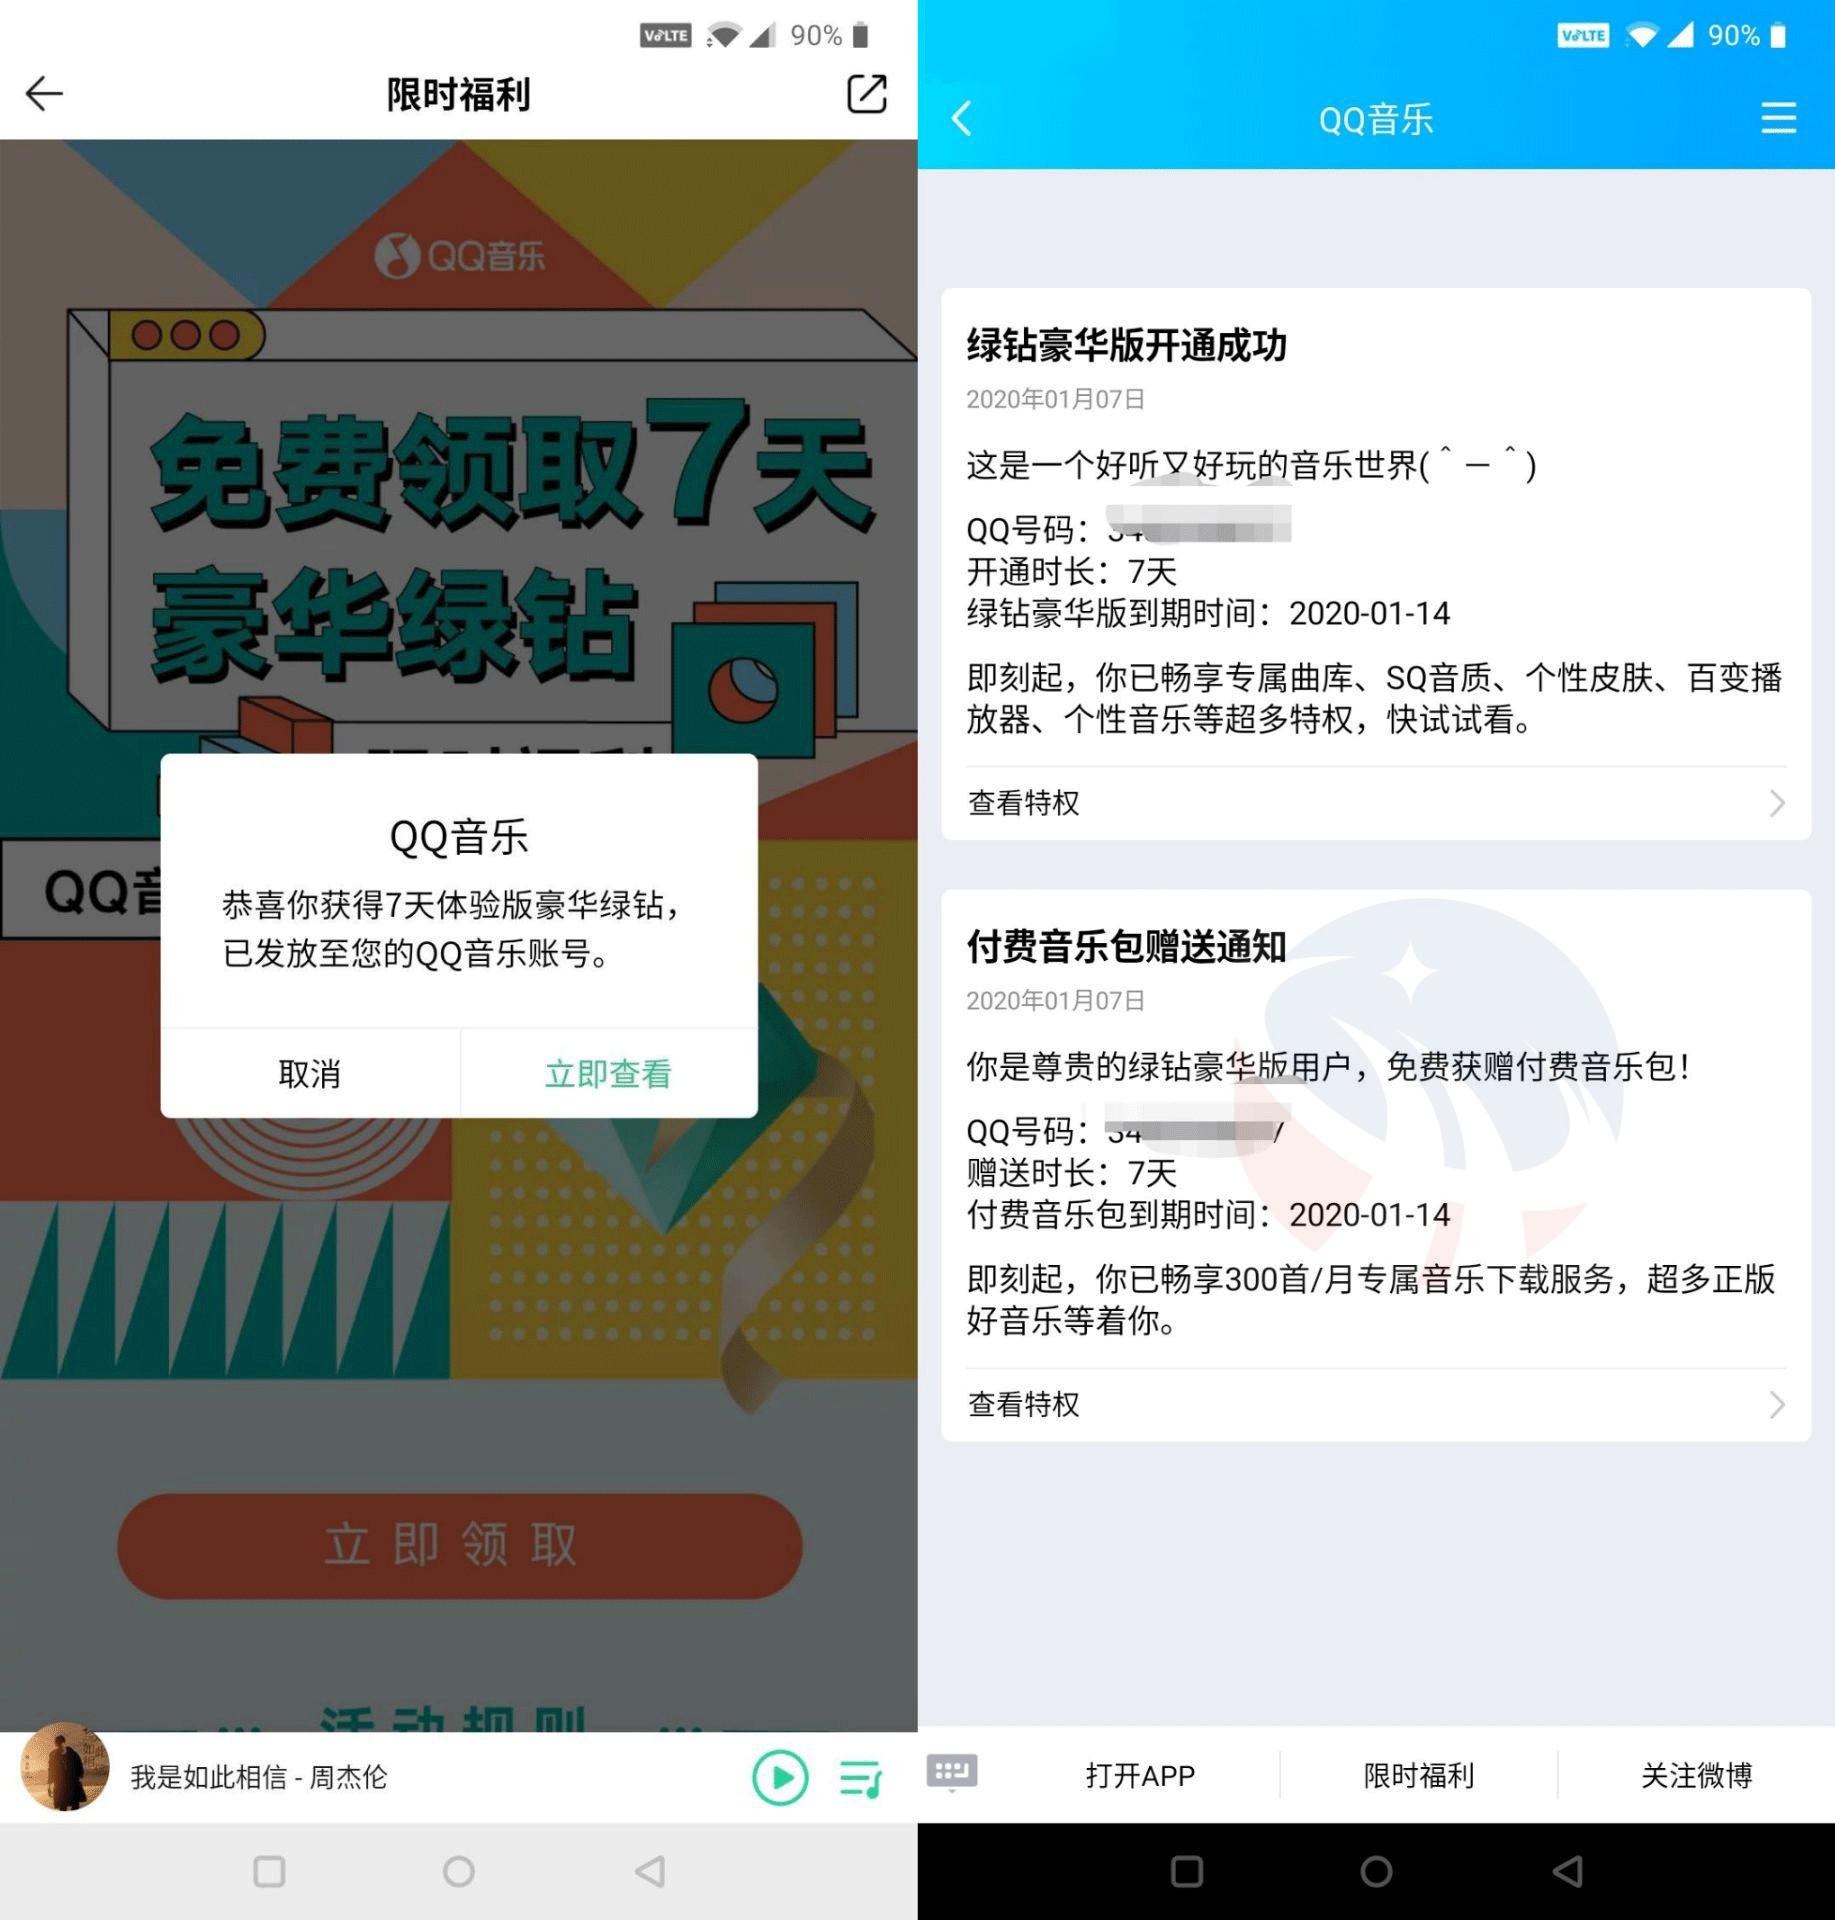 QQ音乐免费领7天豪华绿钻